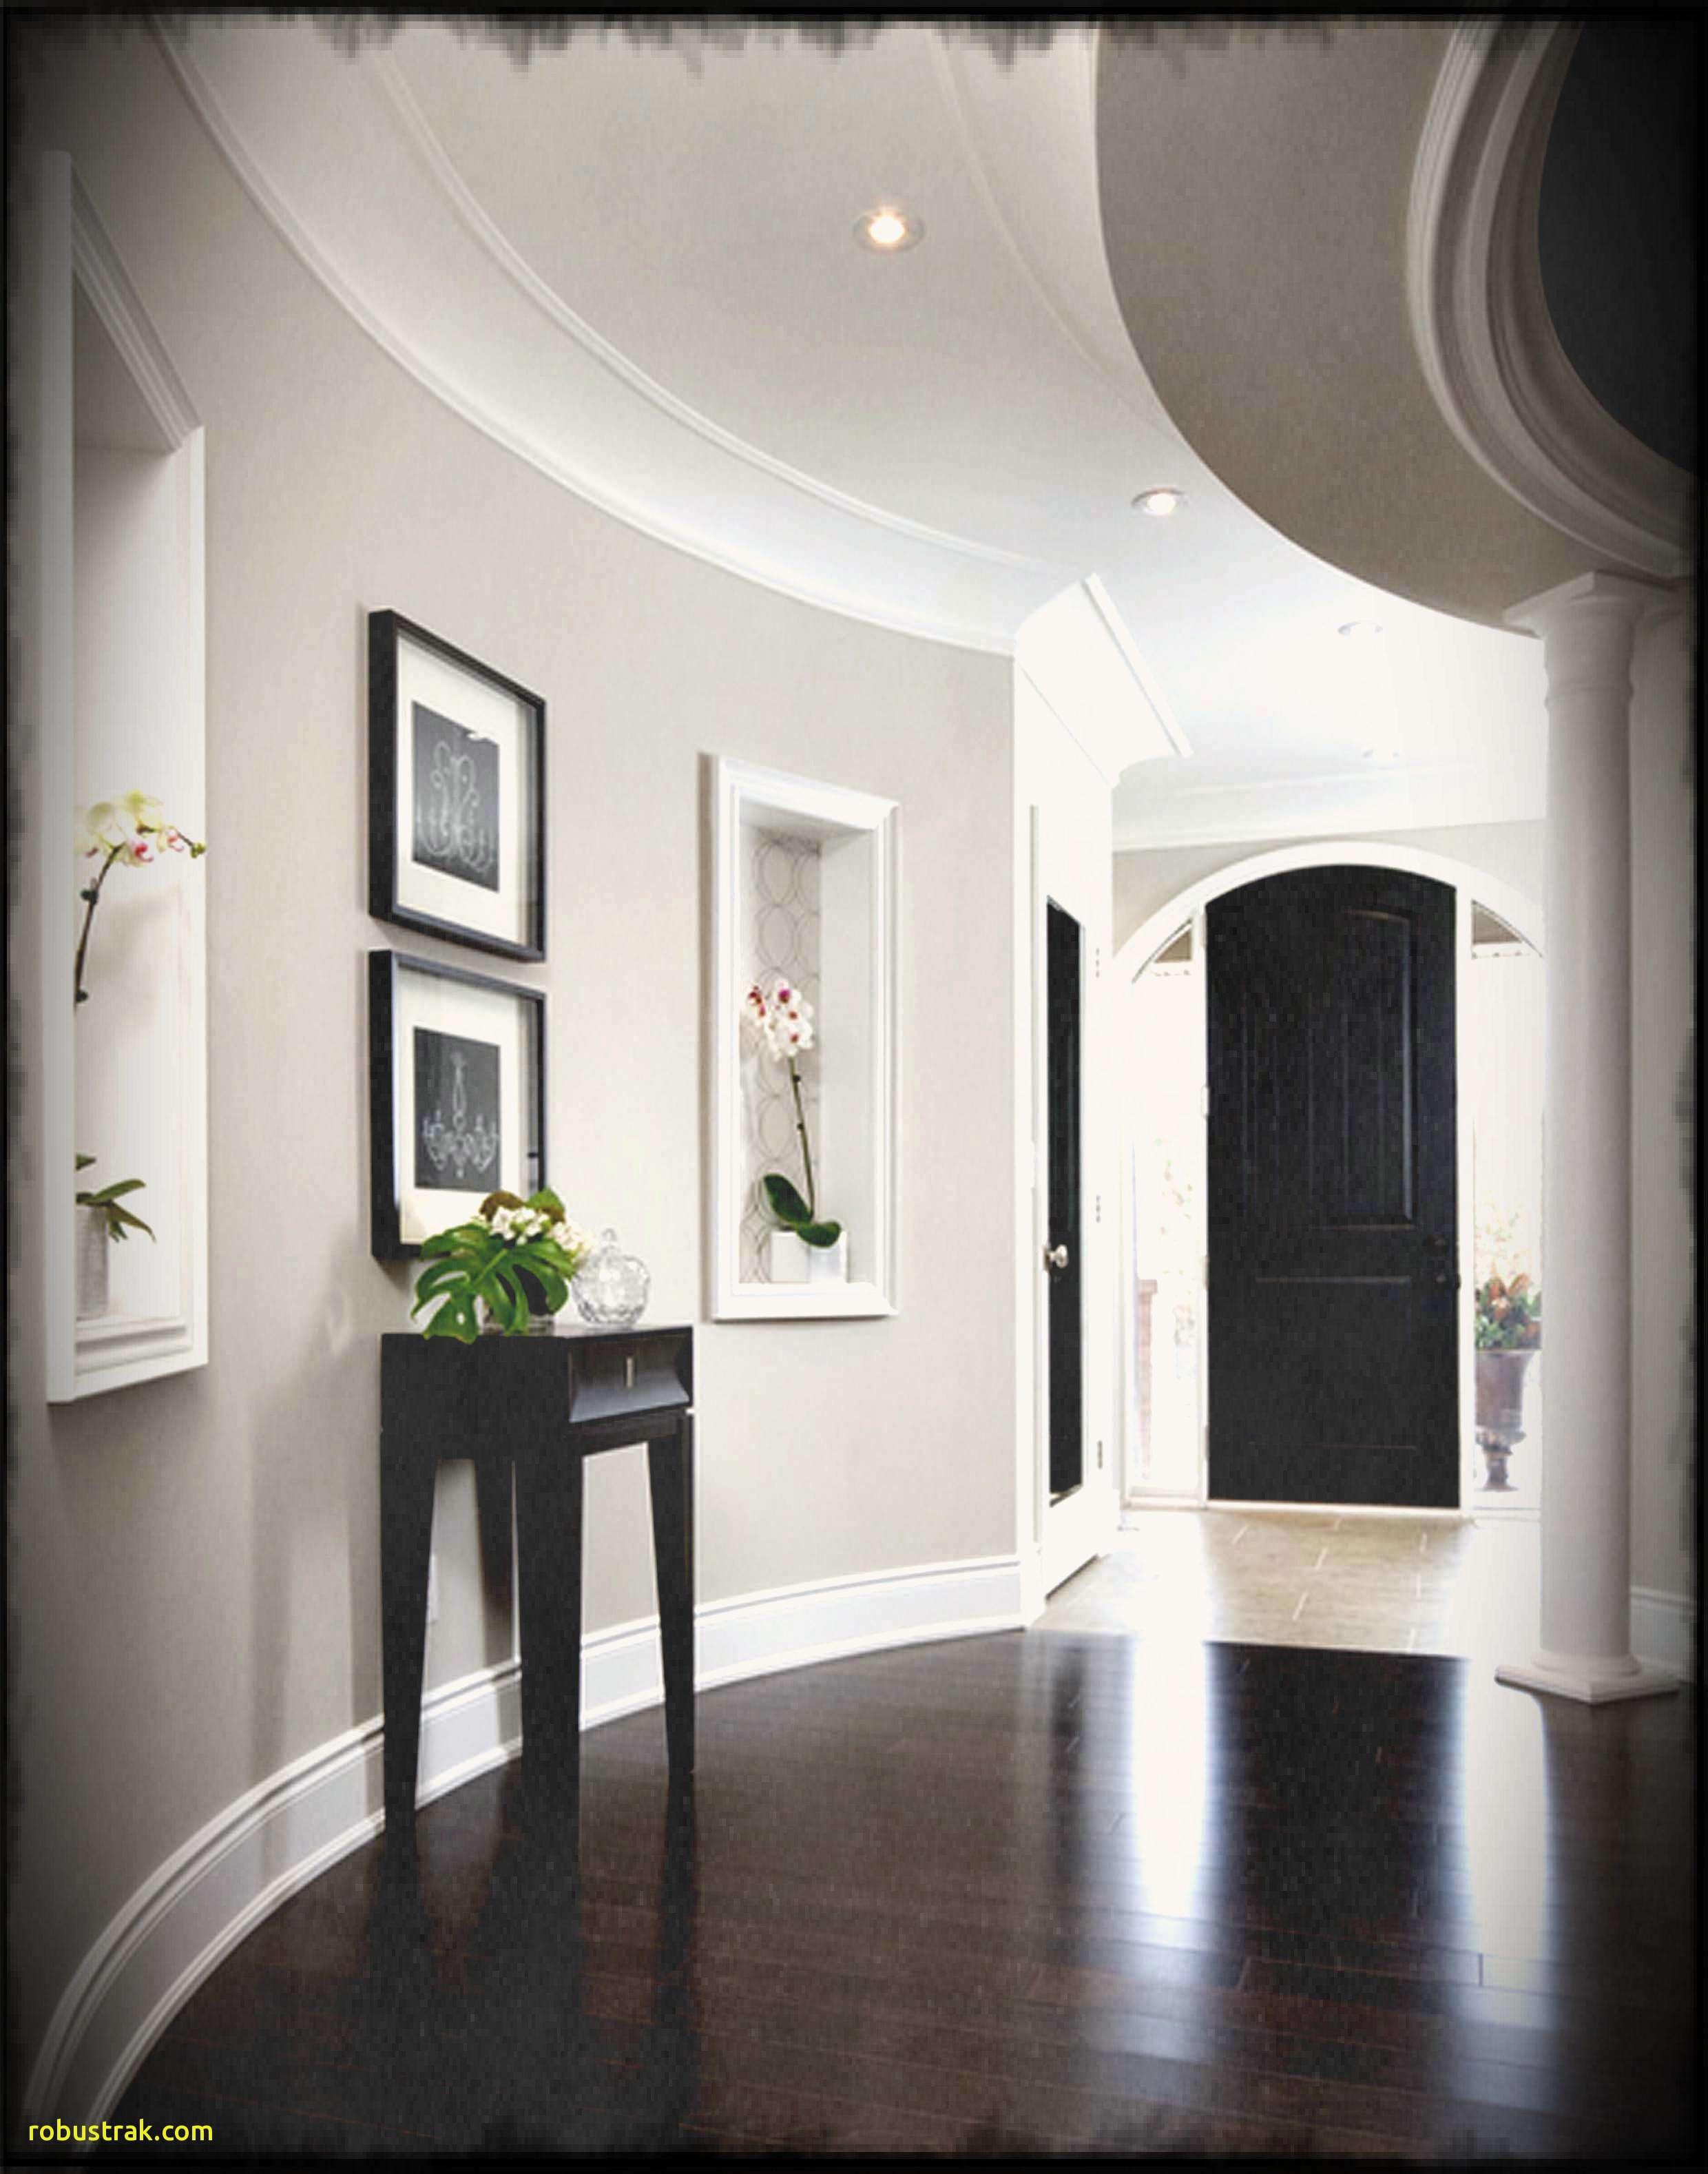 Hardwood Floor Color Trends 2017 Of Lovely Rugs for Dark Hardwood Floors Home Design Ideas Inside Luxury Idea Dark Wood Floors with Grey Walls What Color Carpet Goes Download Gencongress Surripuinet